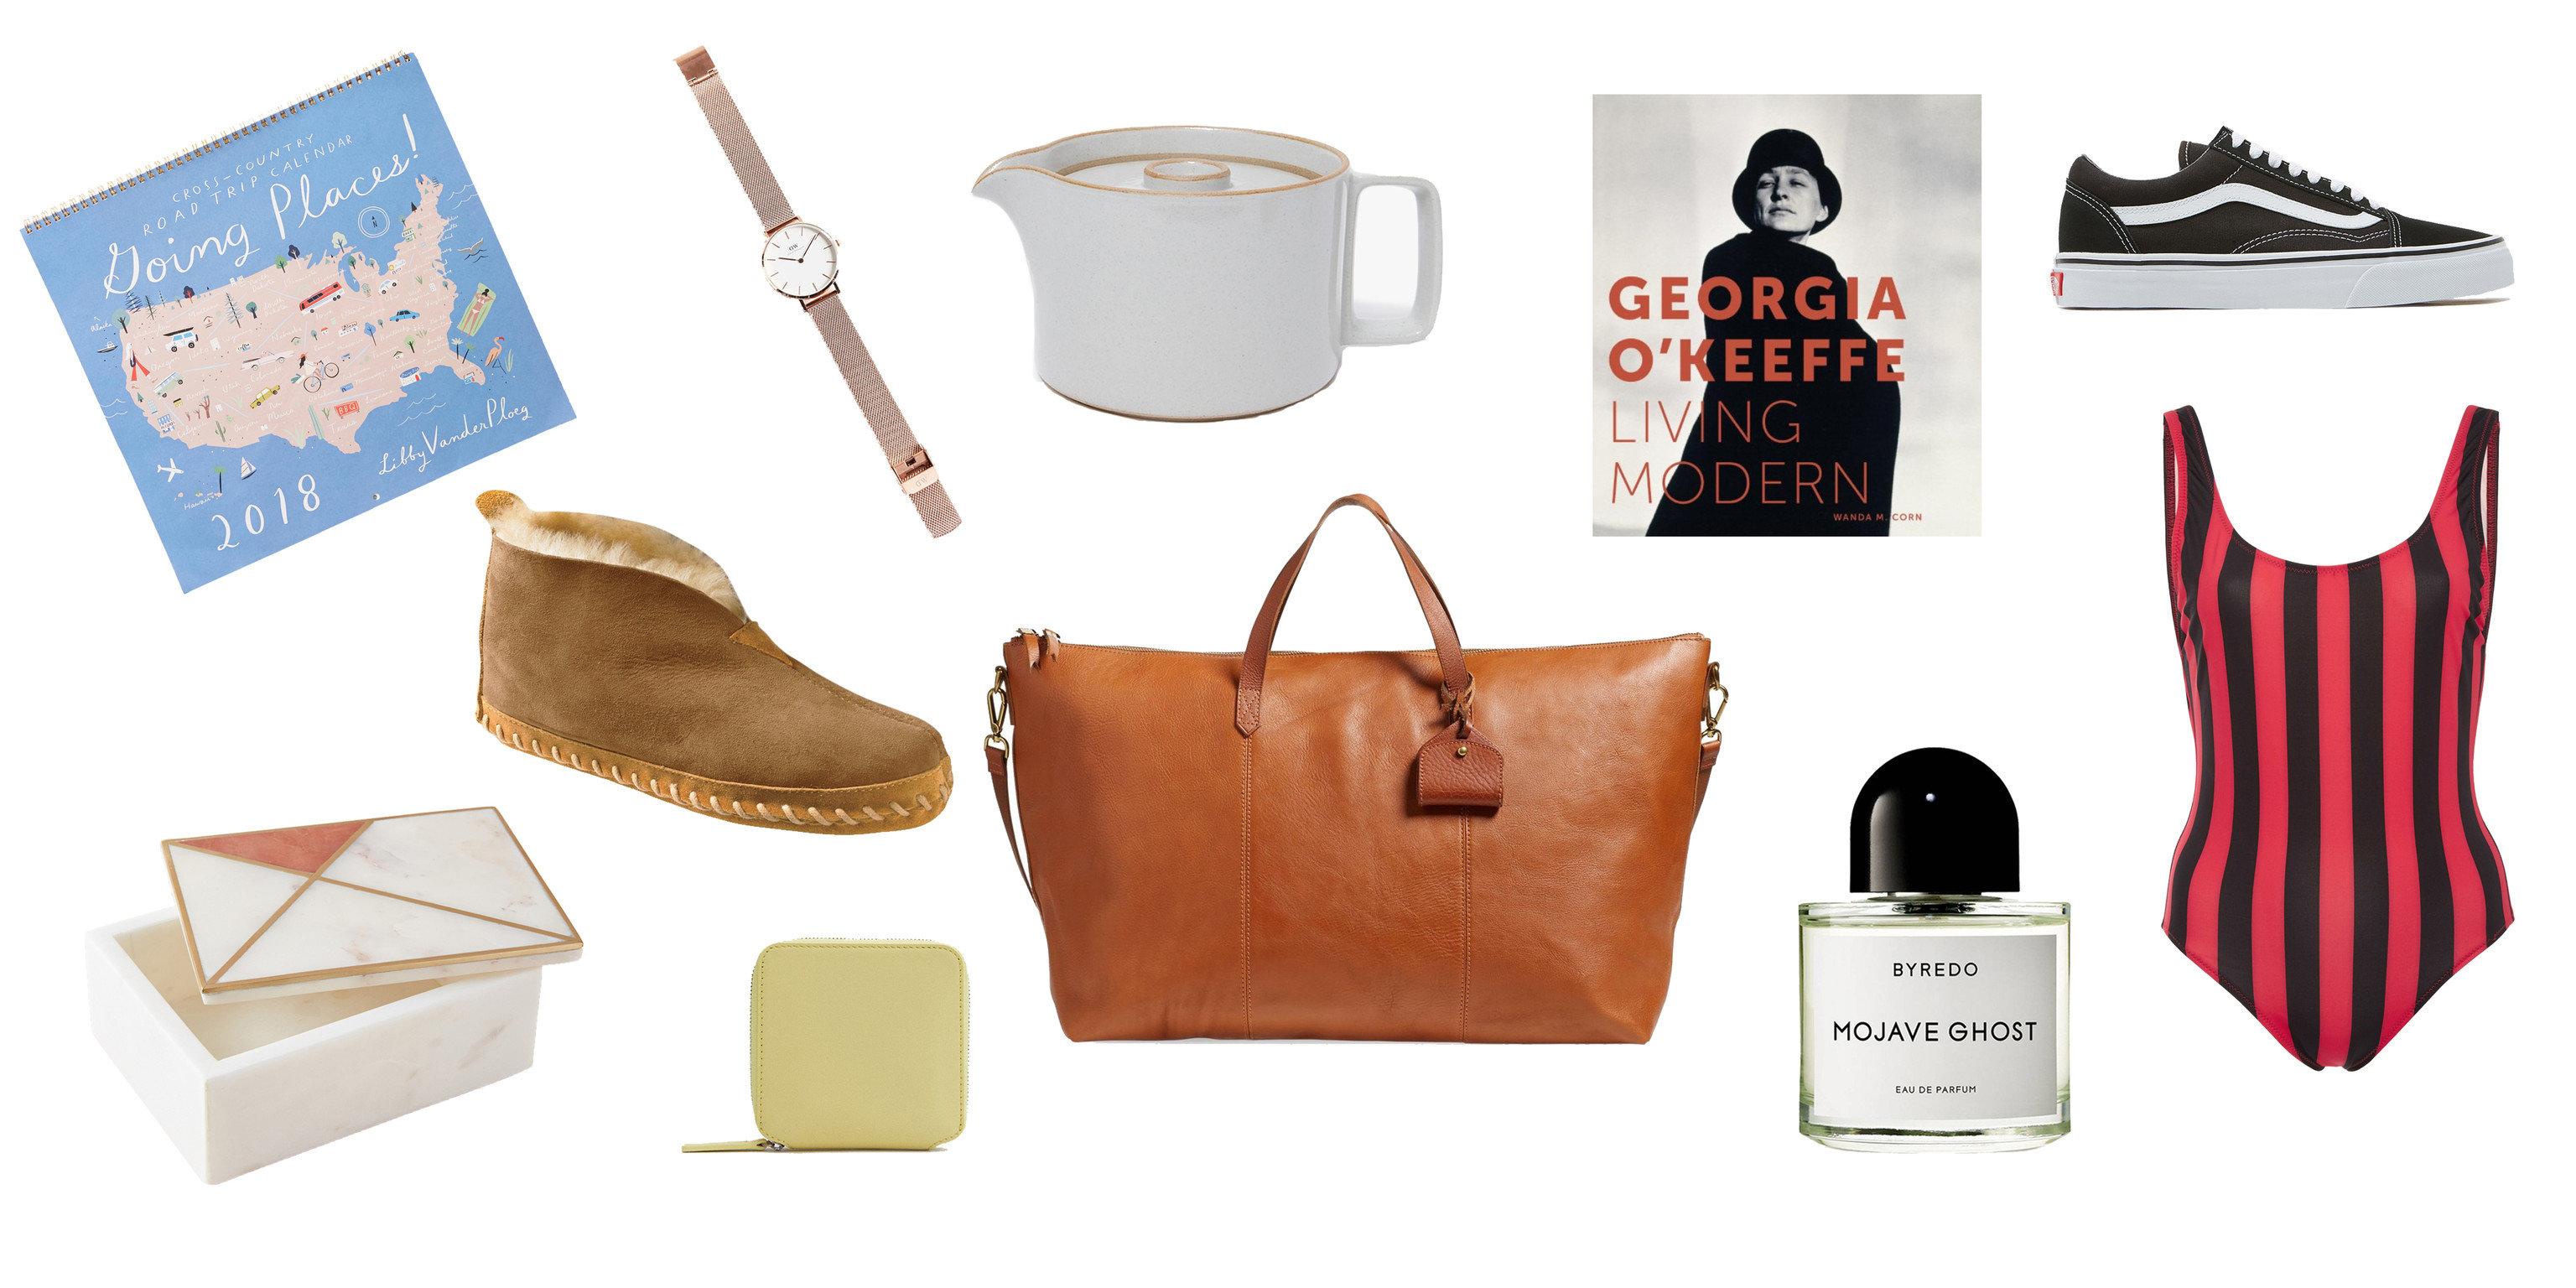 Gift Guides Style + Design Travel Shop bag handbag indoor product fashion accessory fashion selling product design Design gift brand pattern peach